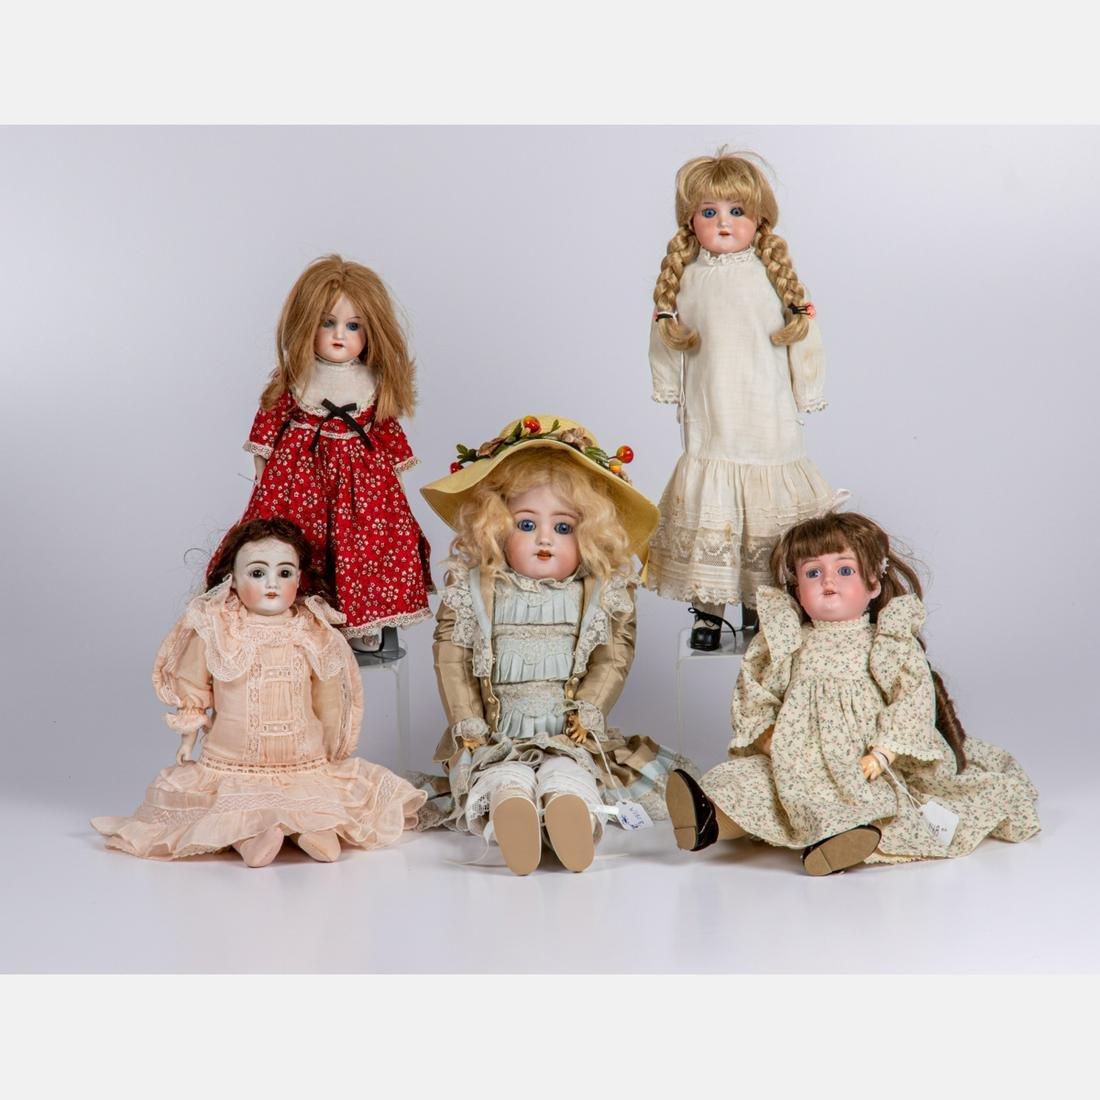 Five Continental Antique Bisque Dolls